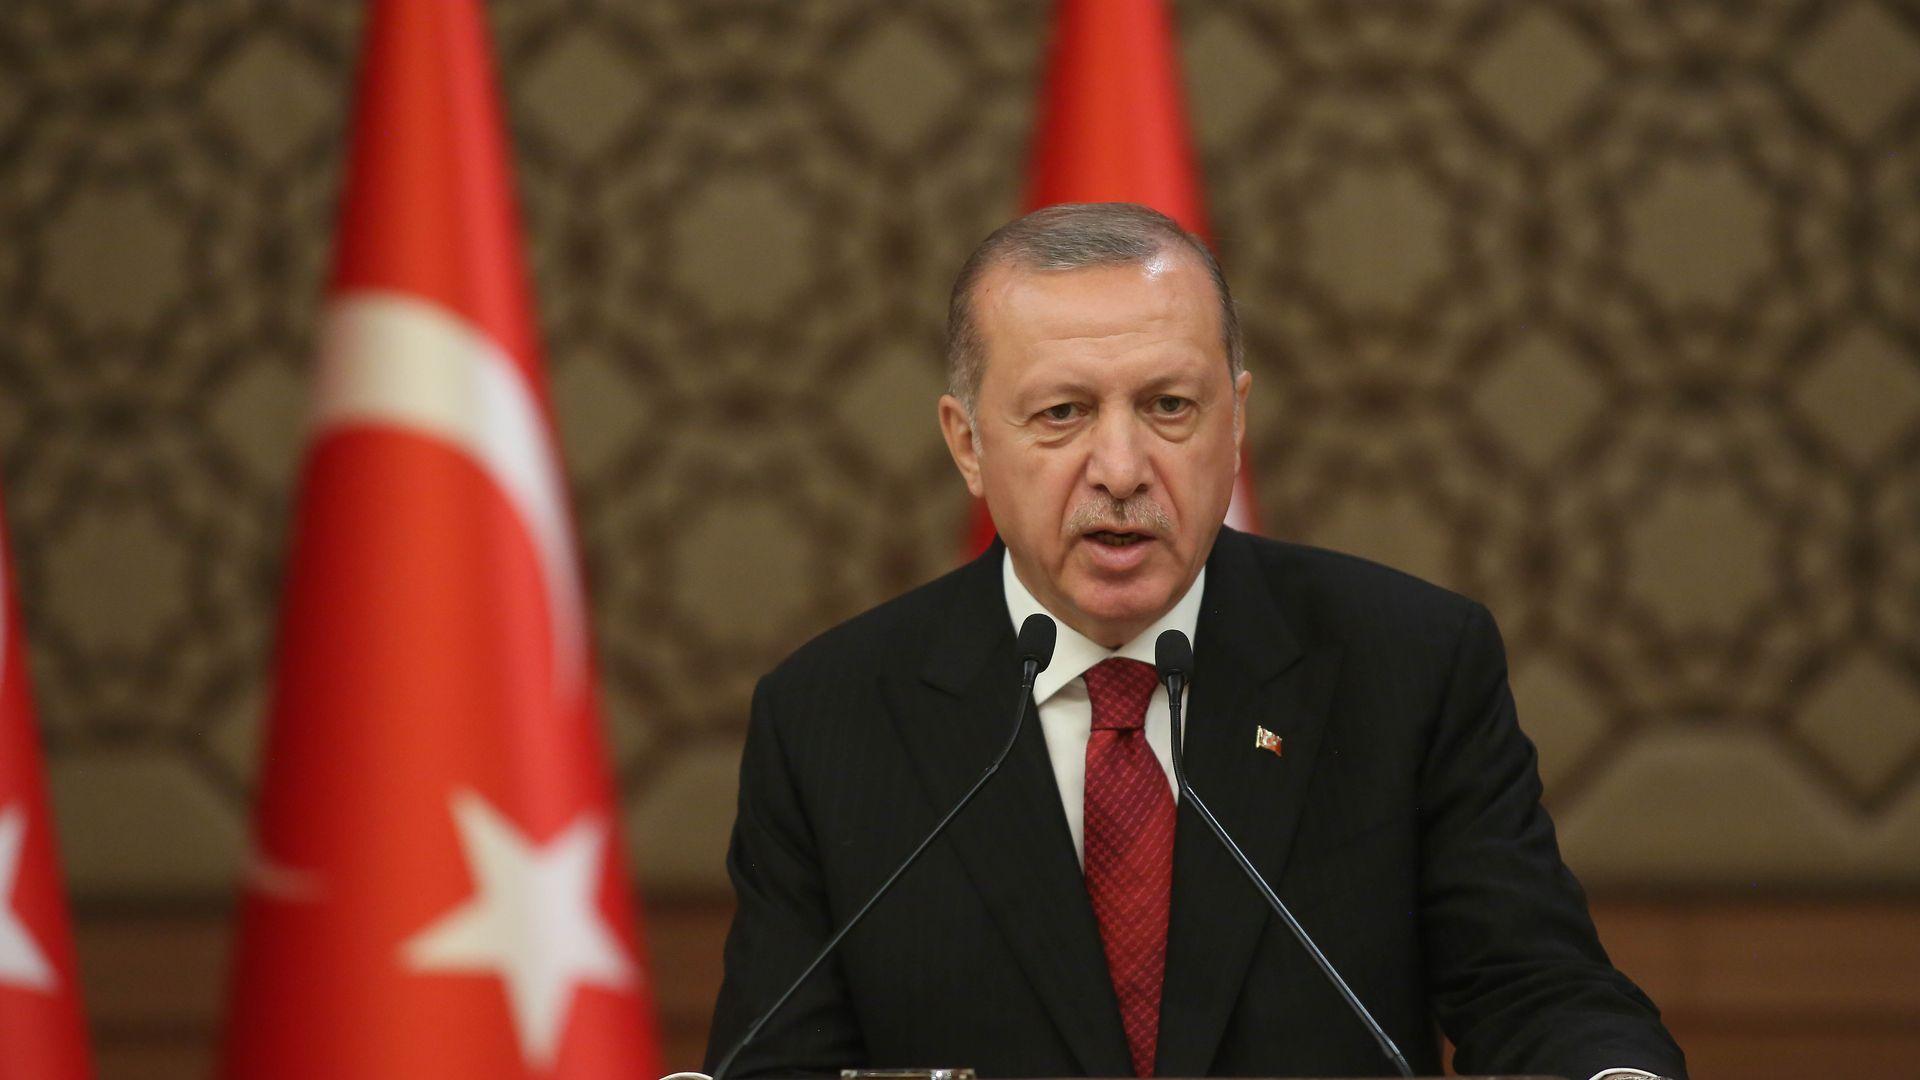 Turkey's President Erdogan giving a speech